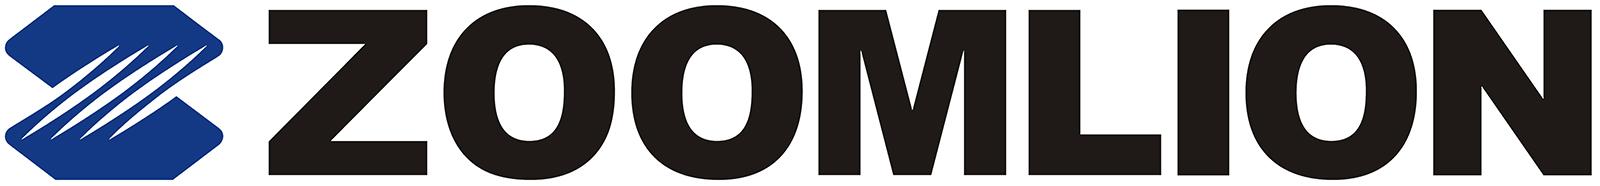 http://million-base.com/wp-content/uploads/2015/04/1-Zoomlion-Logo.jpg